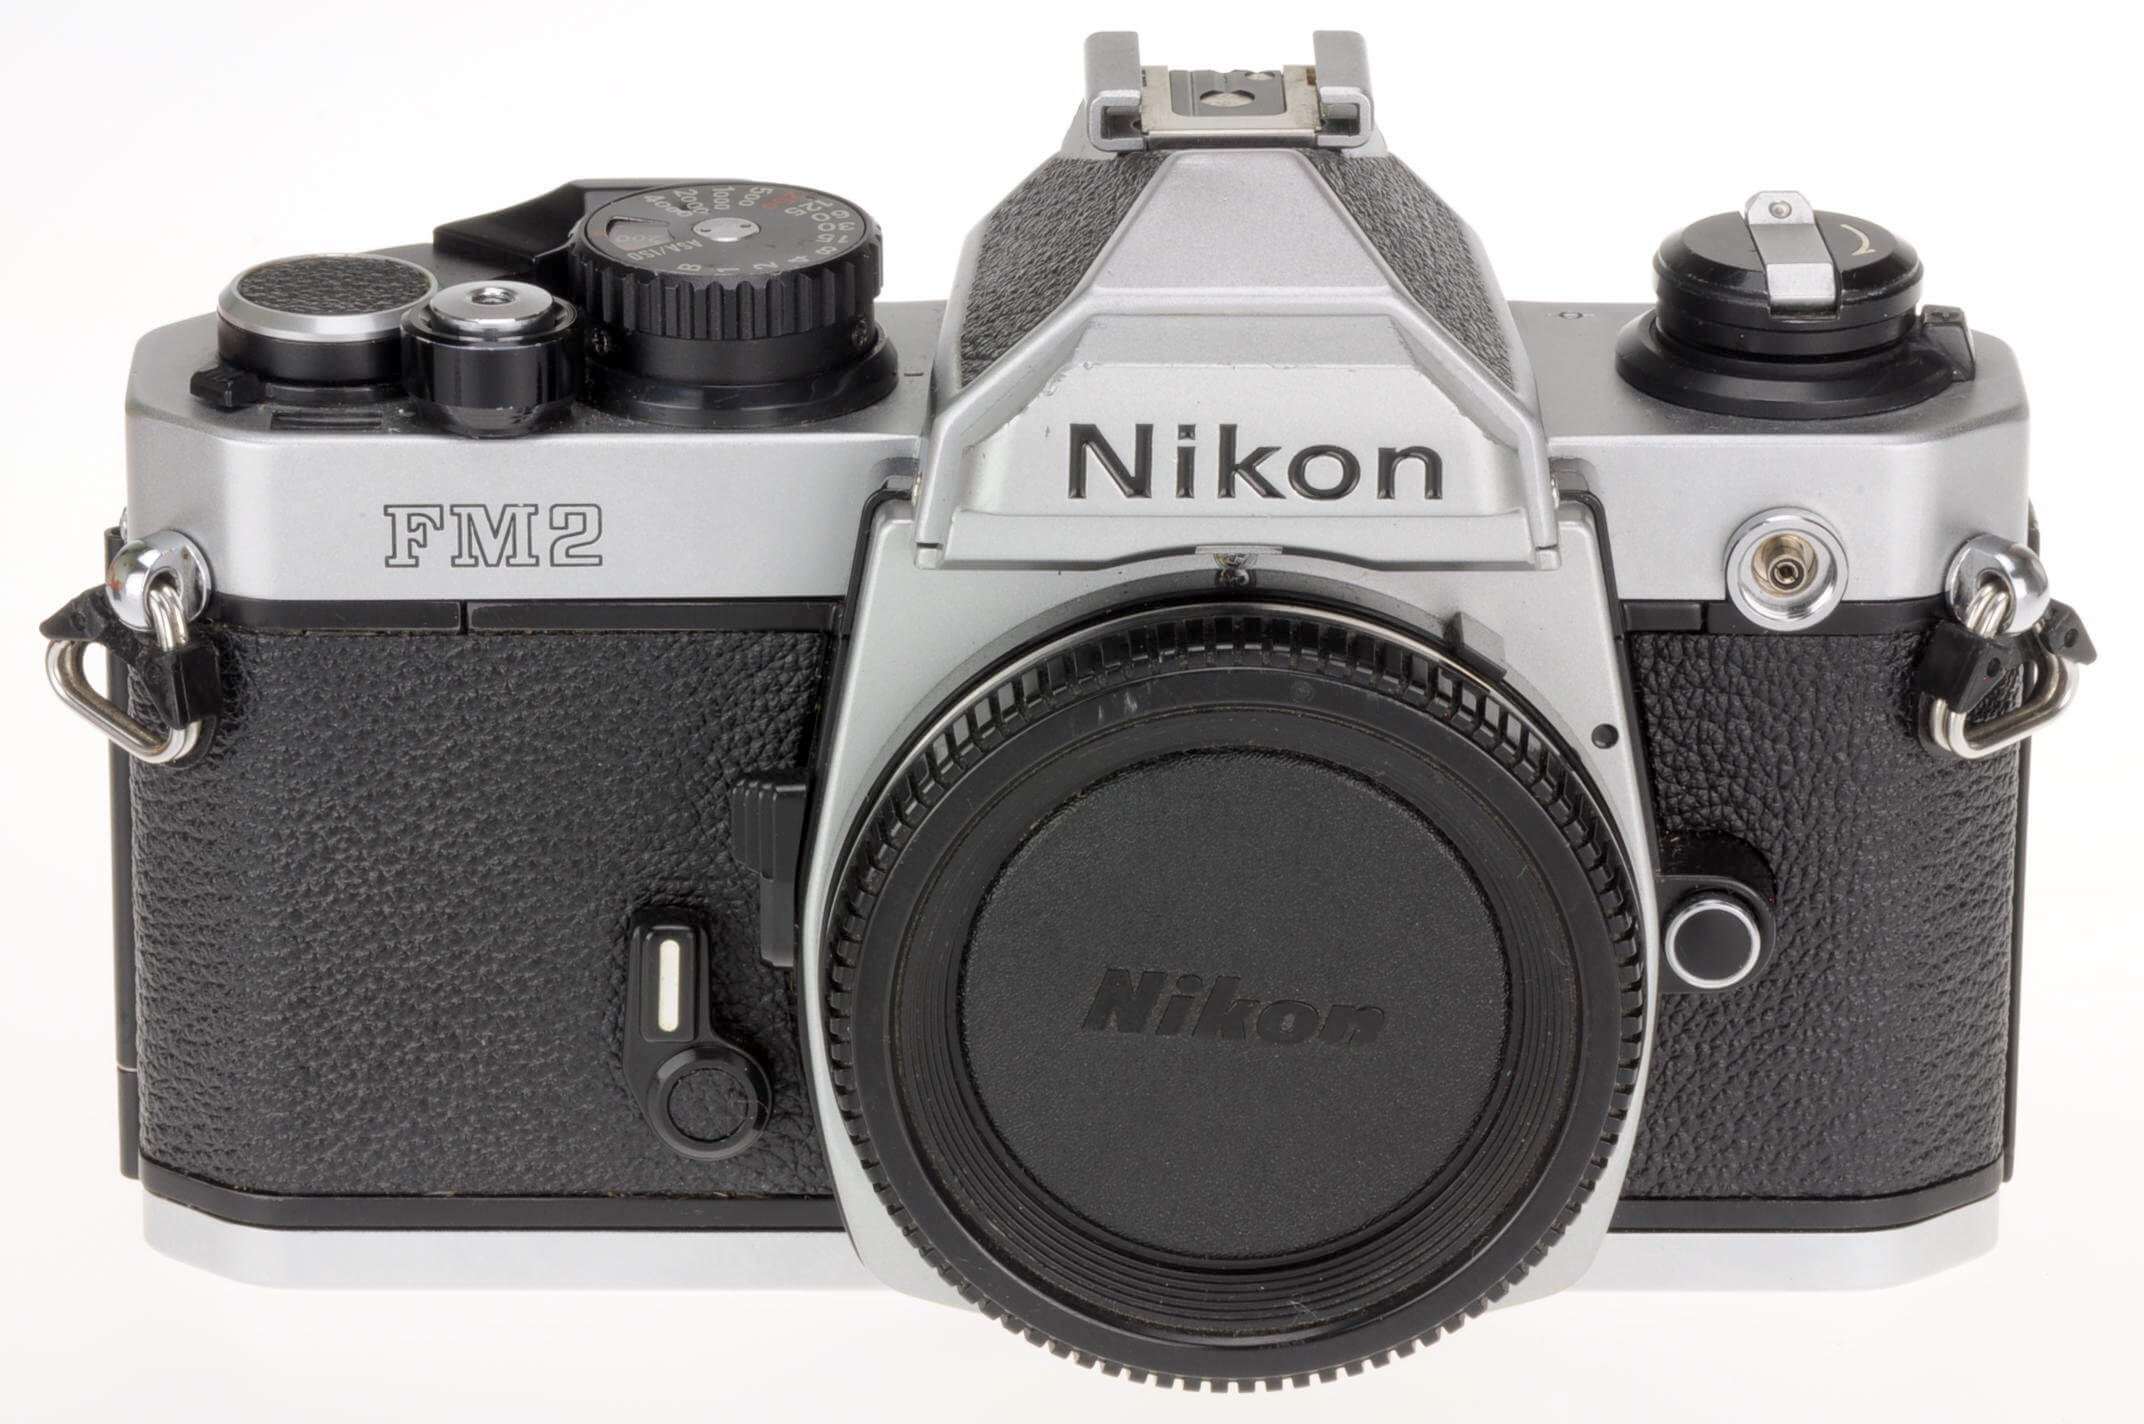 Nikon FM2n body, excellent user!